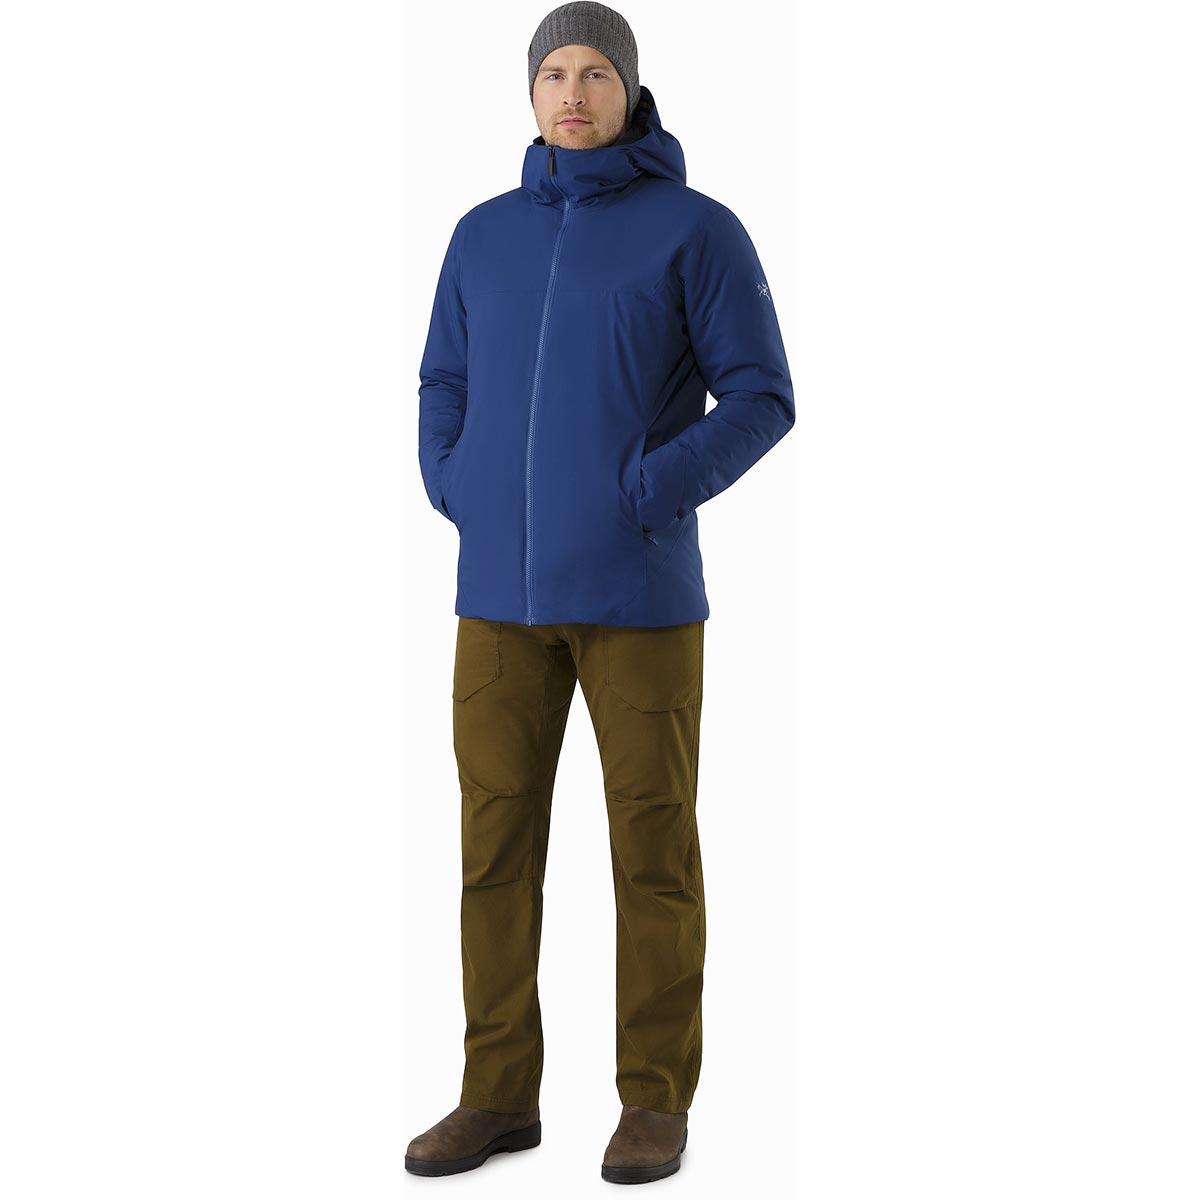 Arc Teryx Koda Jacket Men S Discontinued Fall 2018 Colors